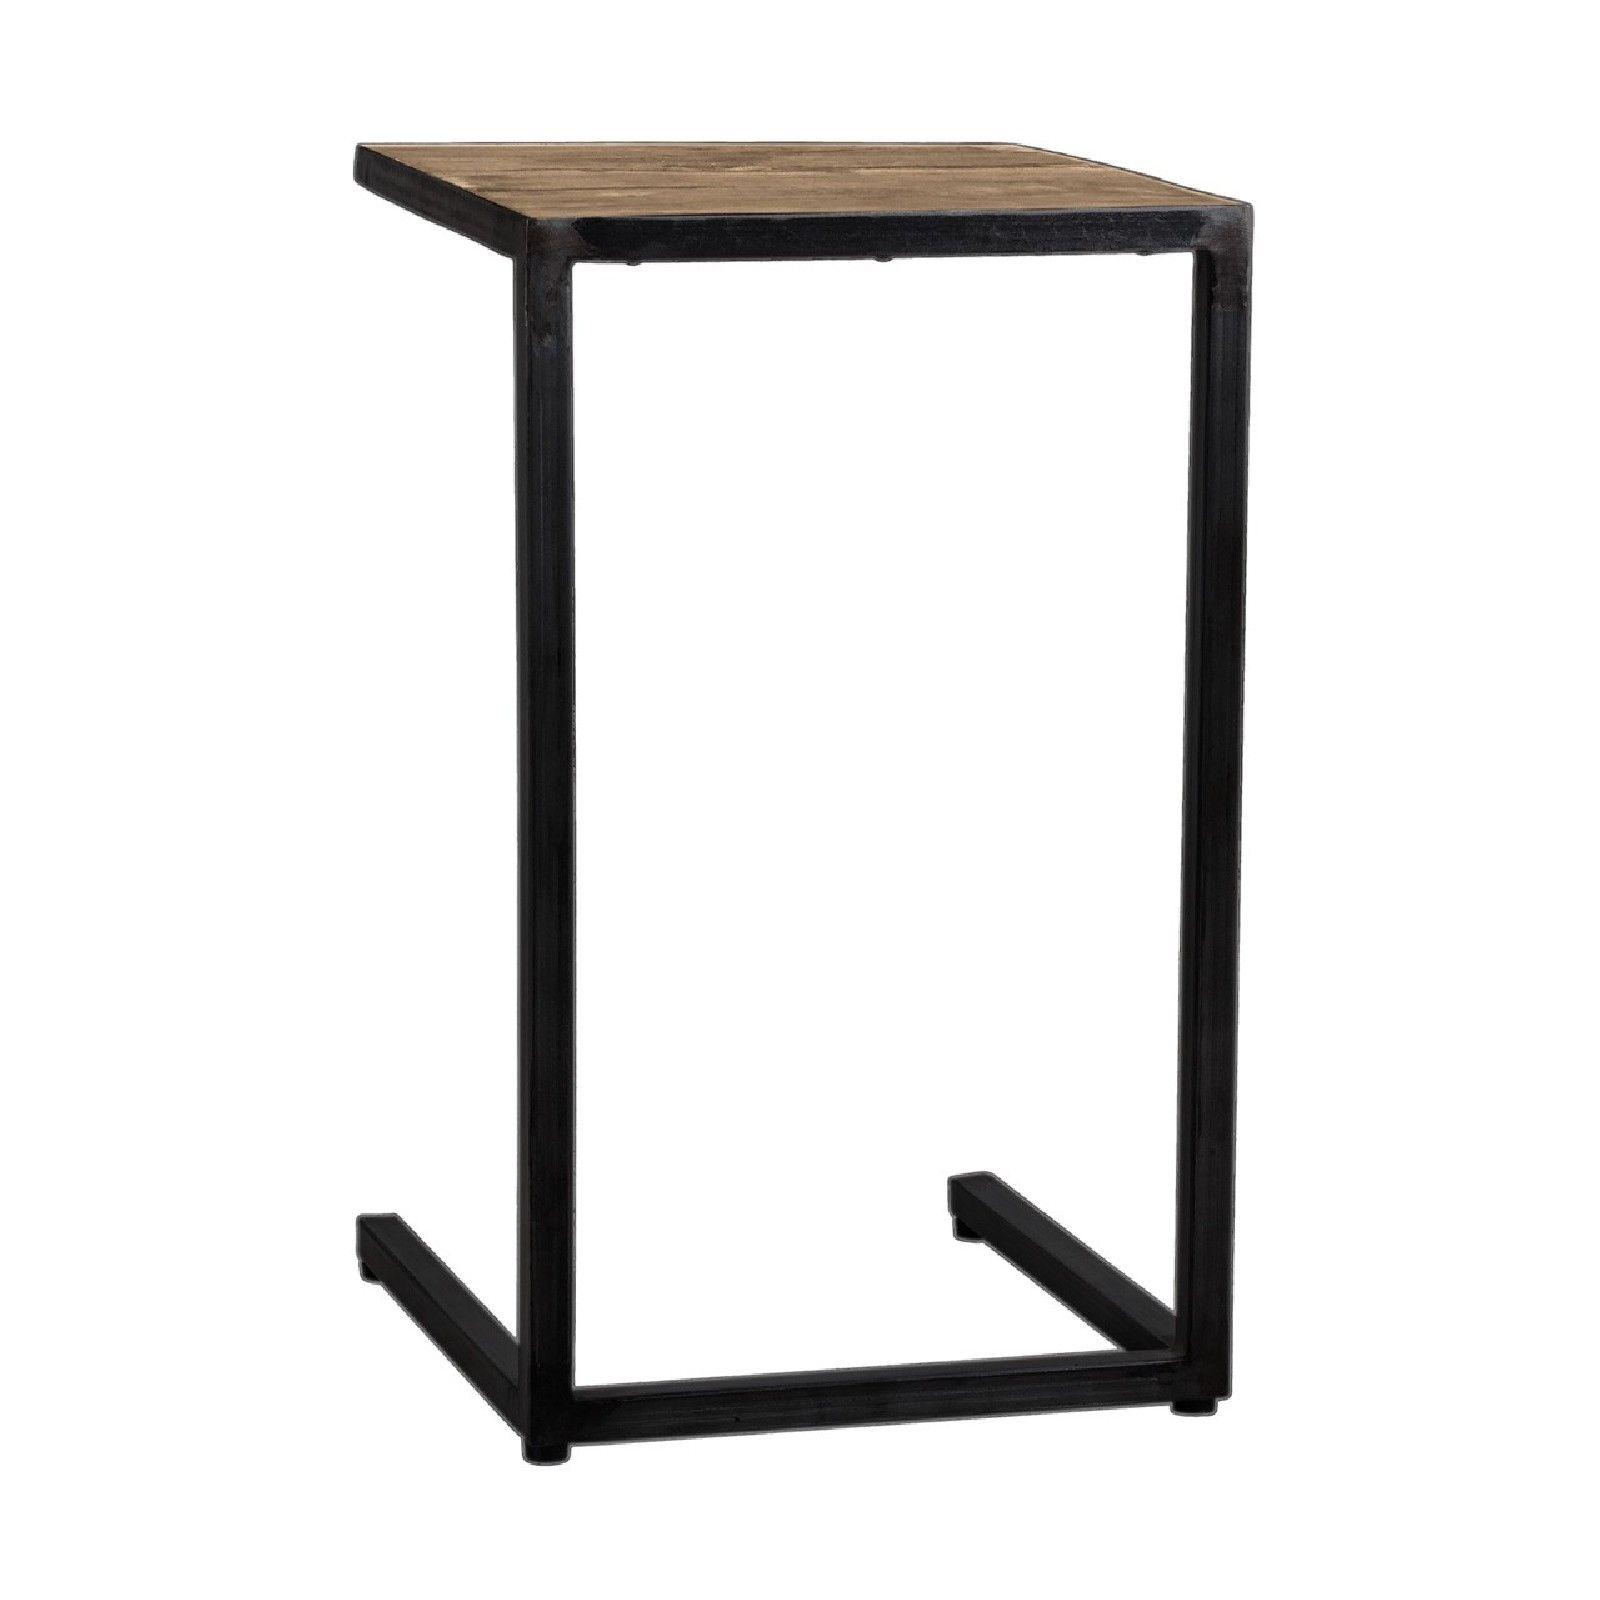 Table d'appoint Raffles, Recyceld wood Meuble Déco Tendance - 47